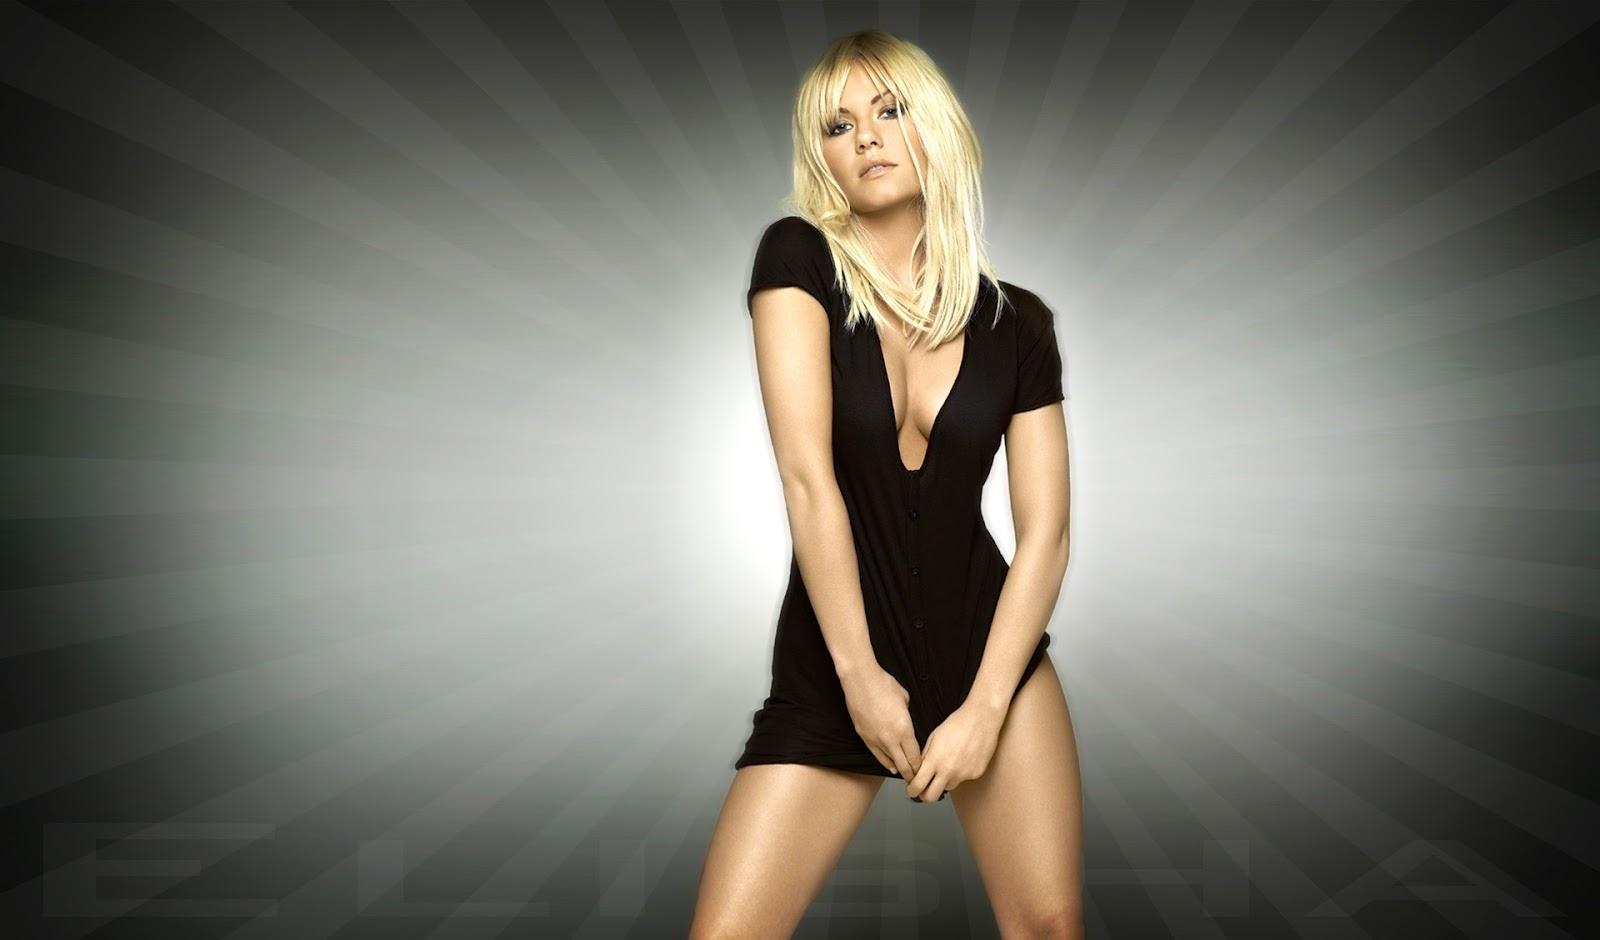 Sexy Elisha Cuthbert Full HD Wallpapers 1080p ~ Top Pix